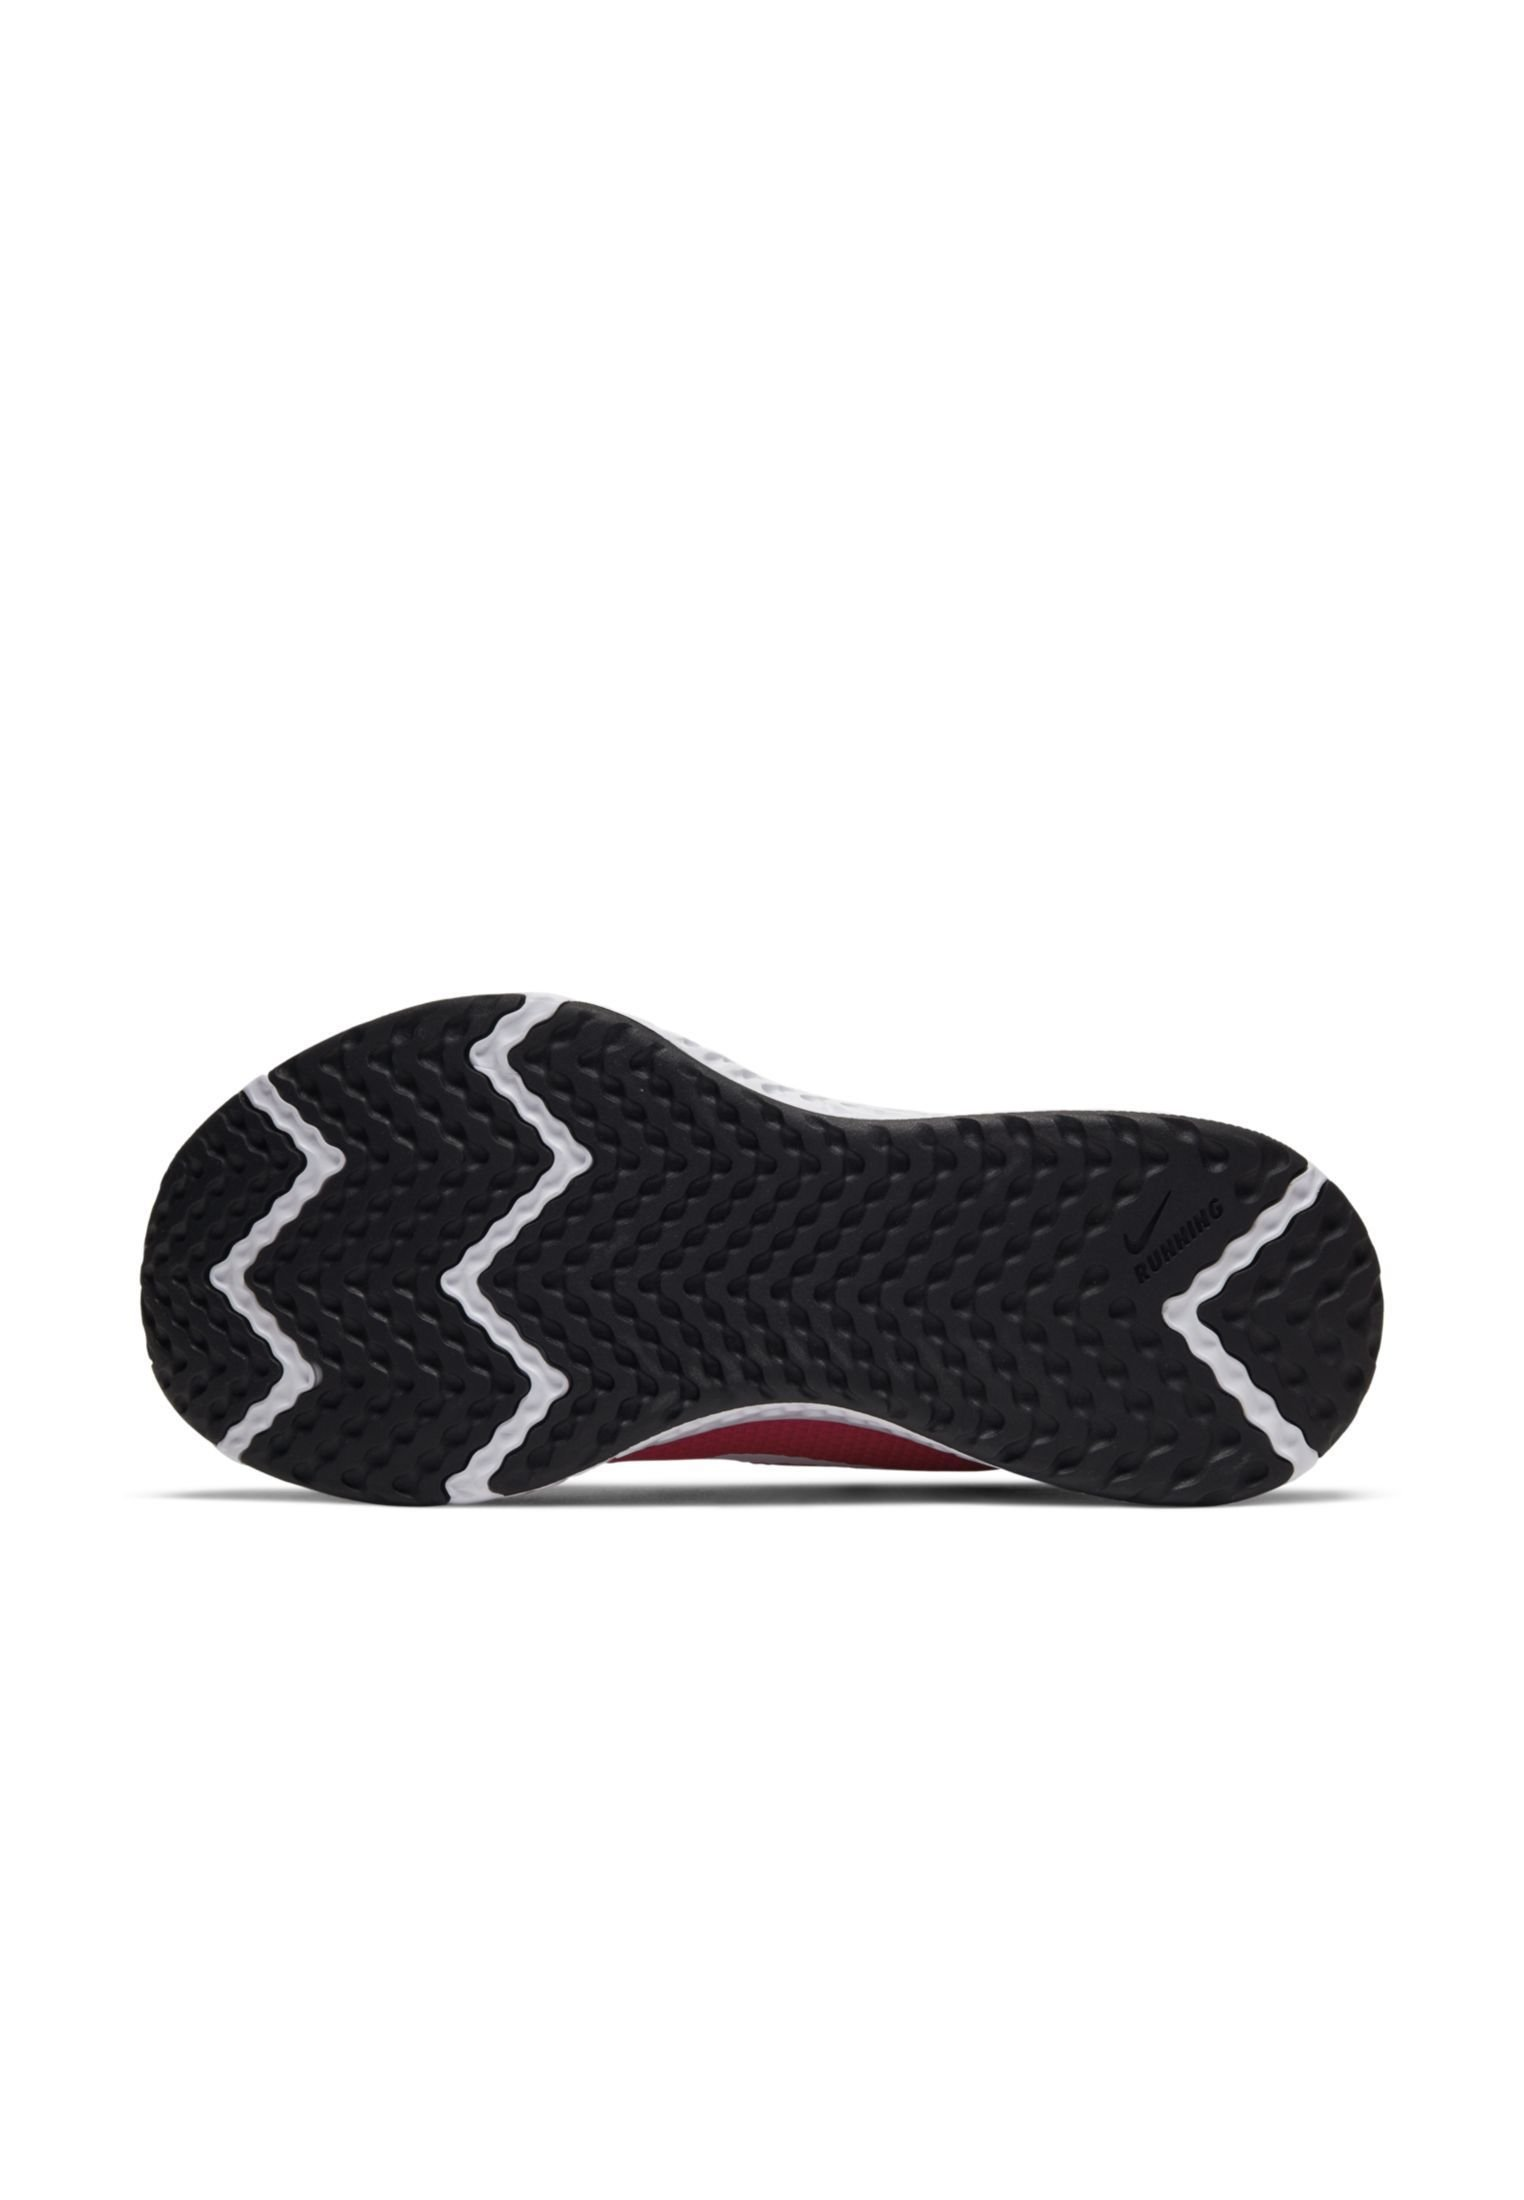 Nike Performance NIKE REVOLUTION 5 FLYEASE MEN'S RUNNING SHOE (EXTRA WIDE) - Chaussures de running neutres - gym red/black/white